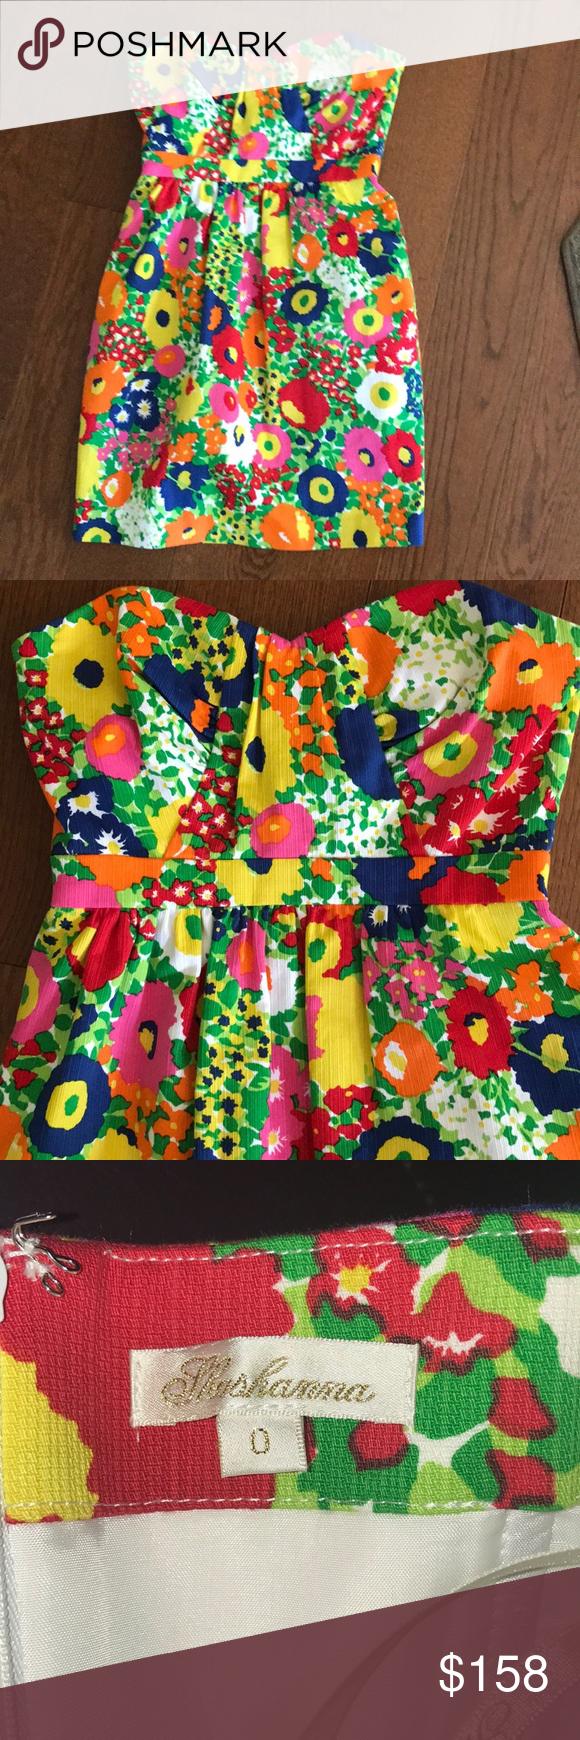 e8e24d4123c 💐SHOSHANNA💐TEXTURE STRAPLESS FLORAL DRESS💐 New without tag Shoshana floral  textured dress.